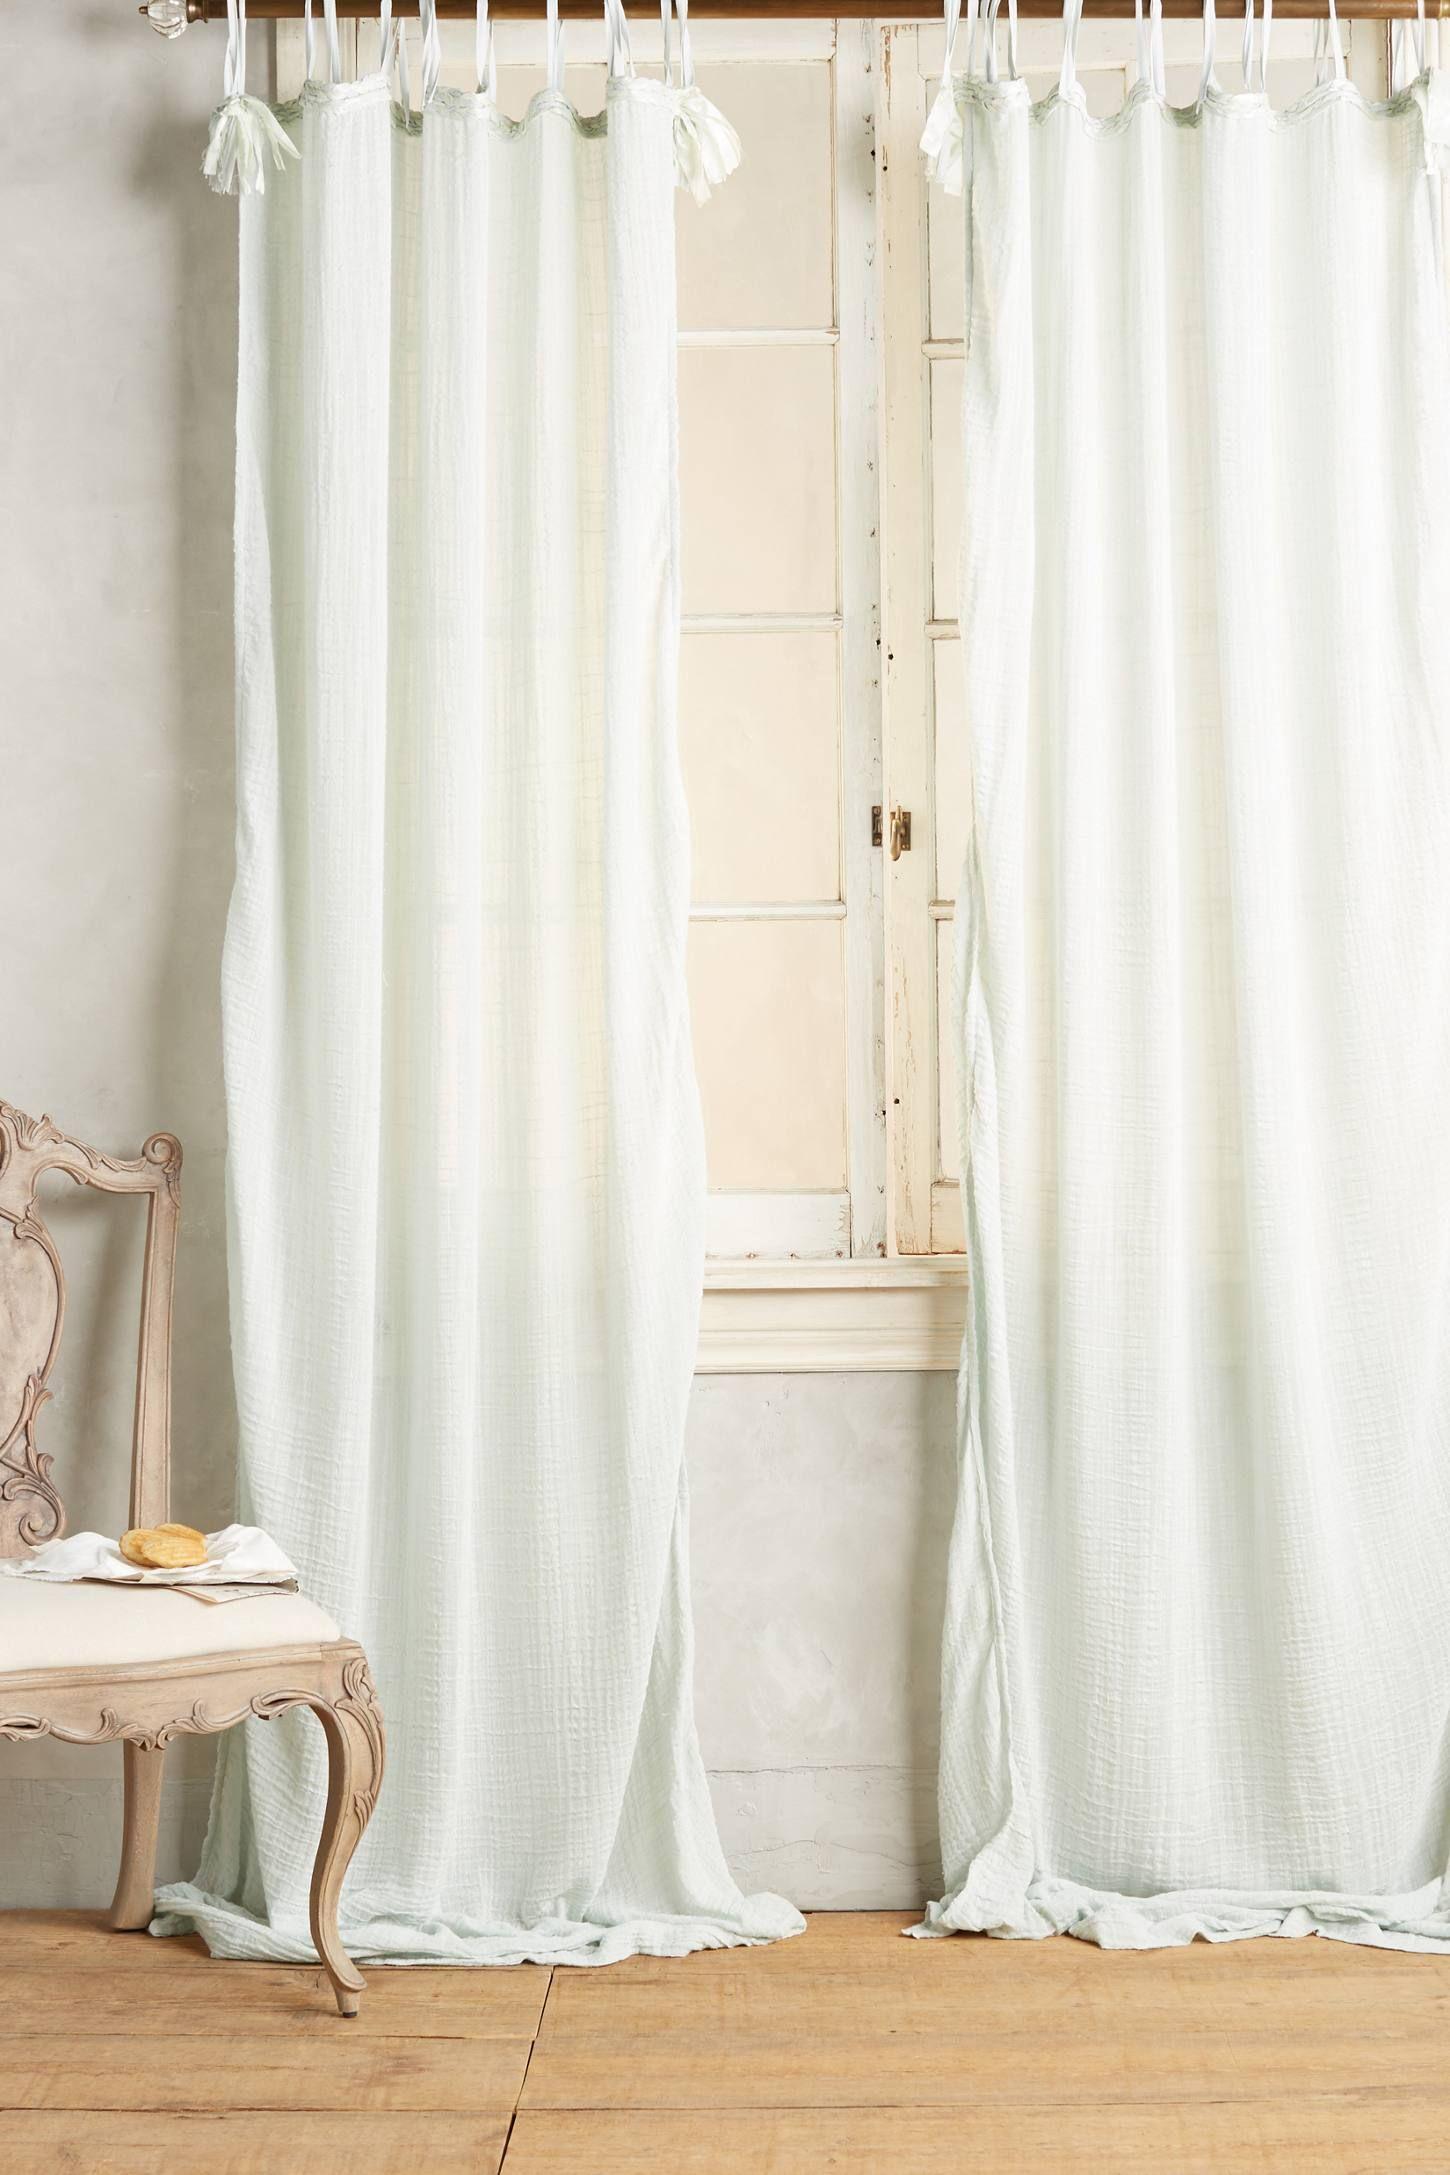 Cotton Tie Top Curtain | Tie Top Curtains, Curtains, Drapes Regarding Elrene Jolie Tie Top Curtain Panels (View 12 of 20)